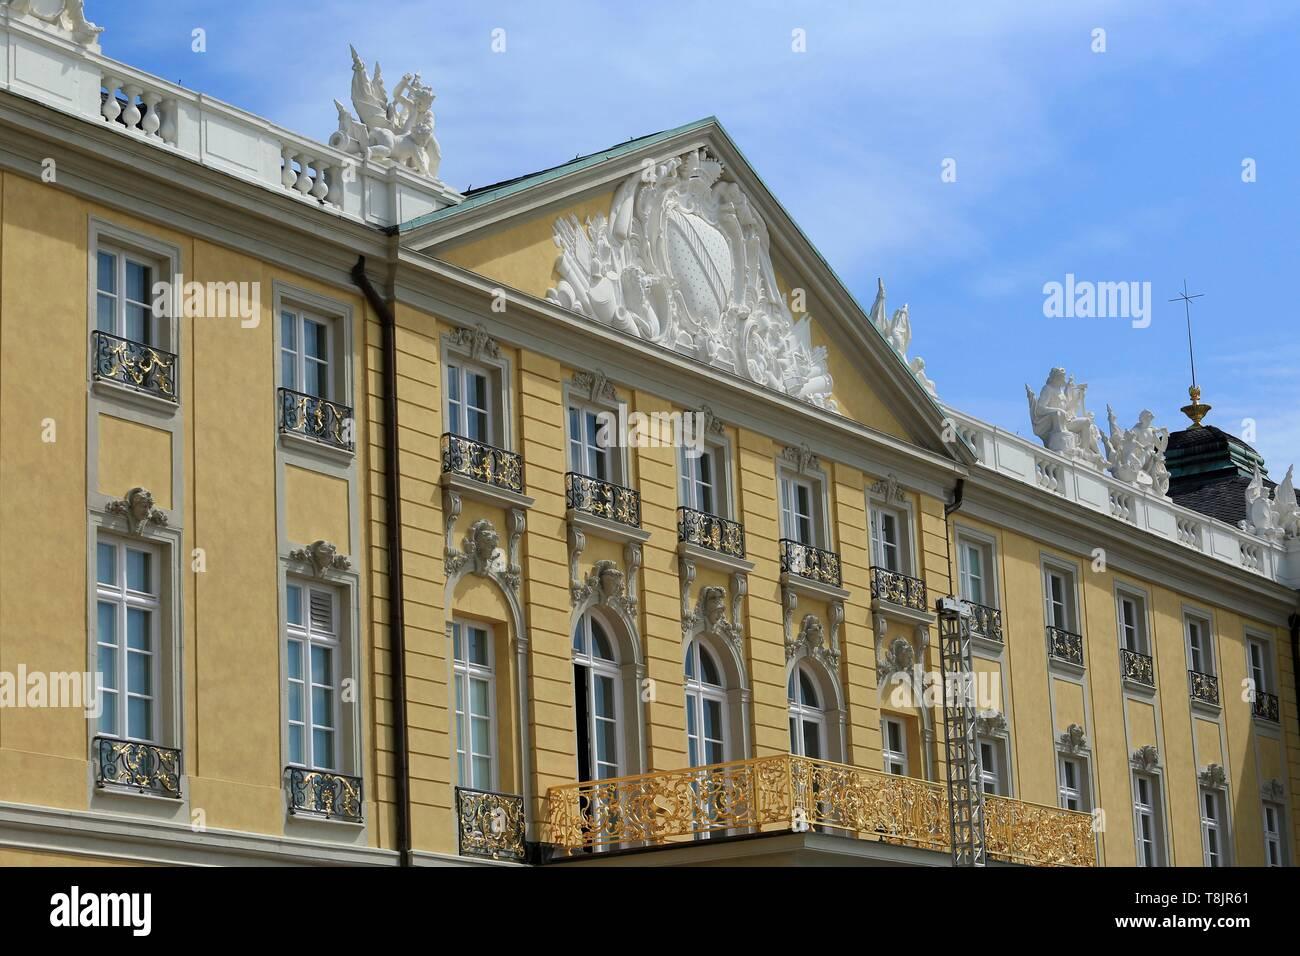 Germany, Baden Wurttemberg, Karlsruhe, Karlsruhe Castle Fronton - Stock Image